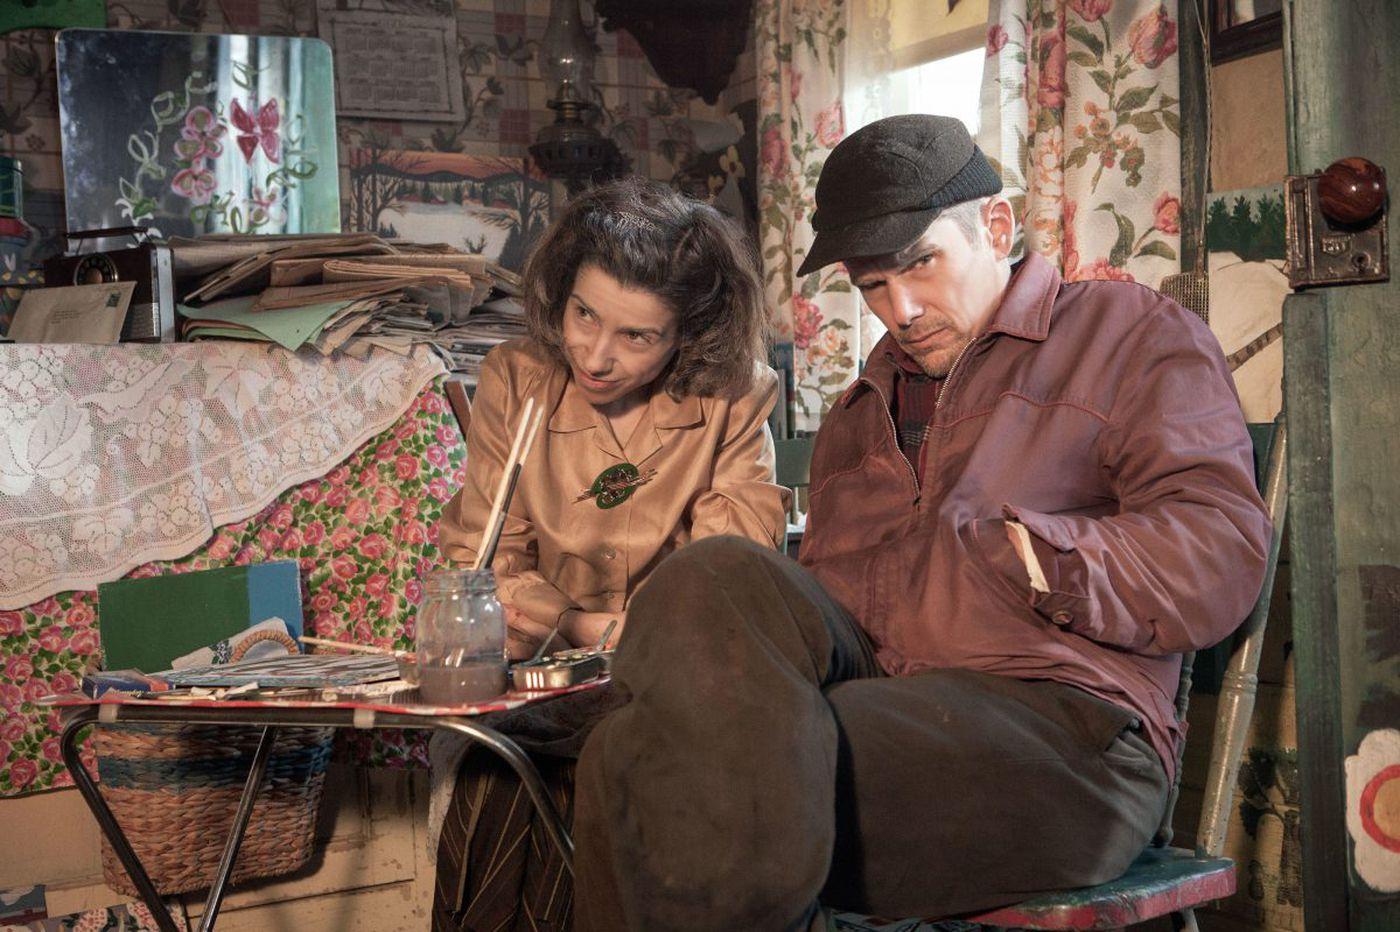 Art initiates life: Moving 'Maudie' tells painter Maud Lewis' inspiring story